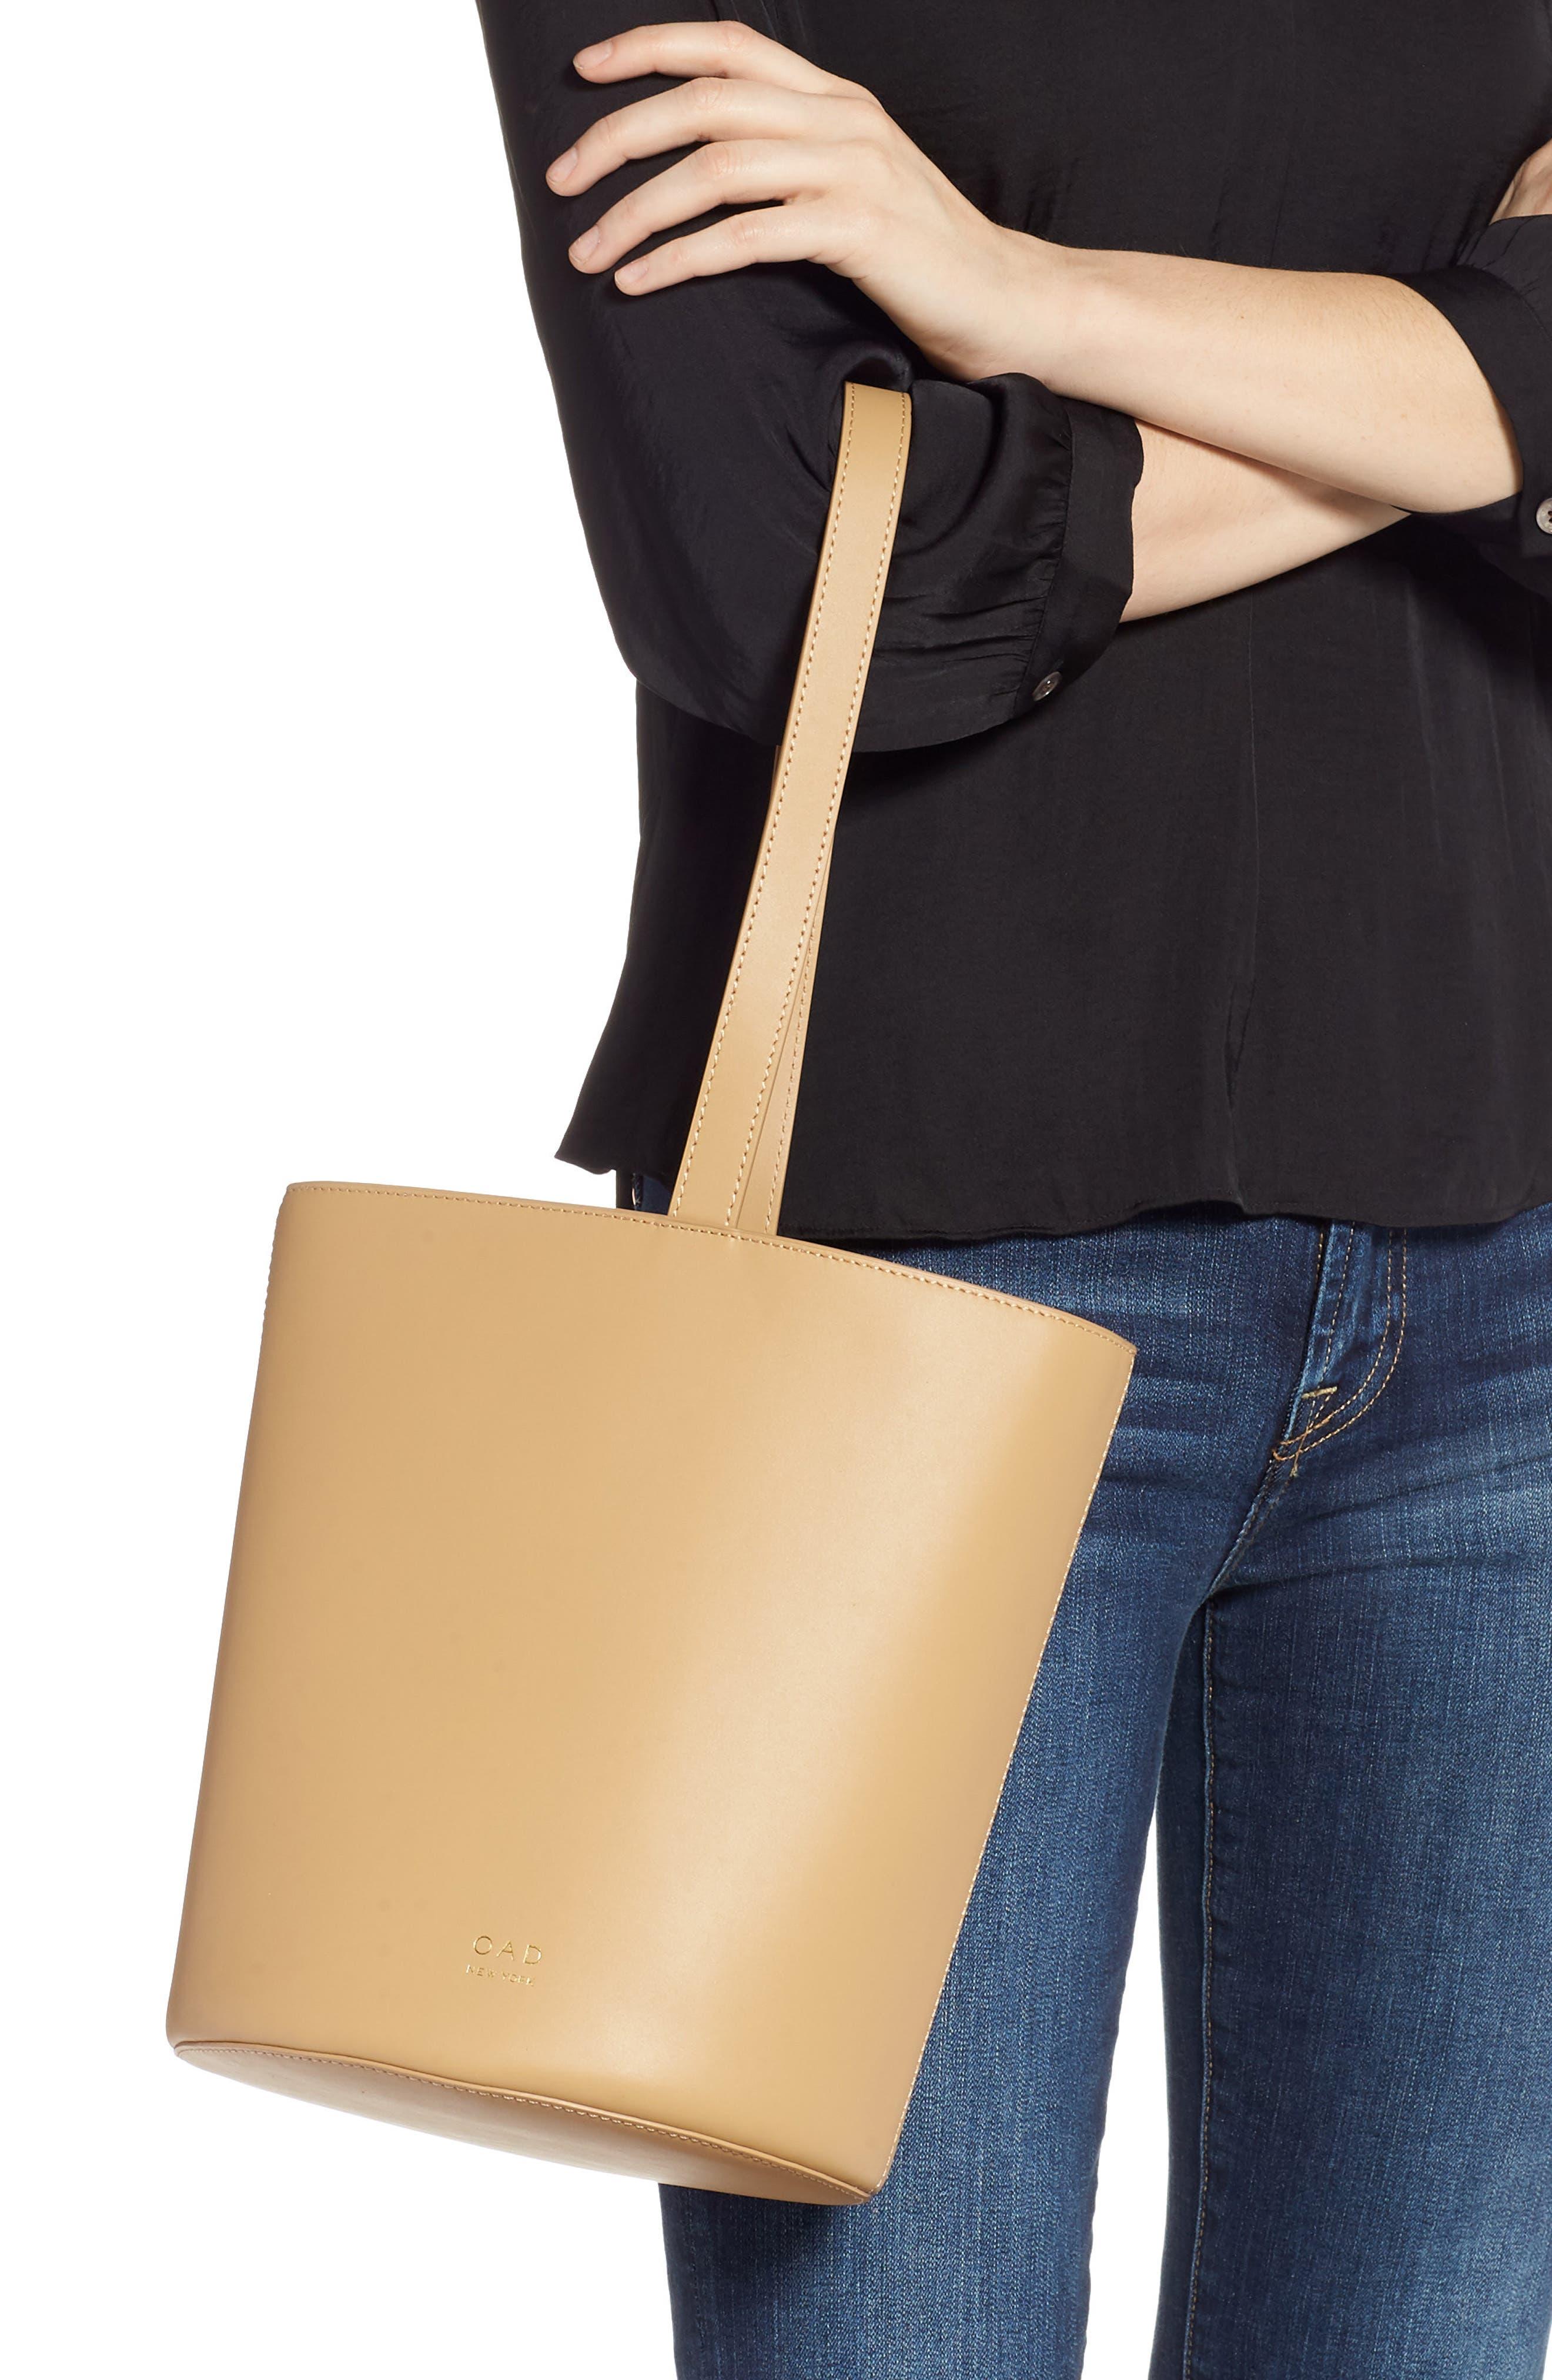 Dome Leather Bucket Bag,                             Alternate thumbnail 3, color,                             LIGHT CAMEL